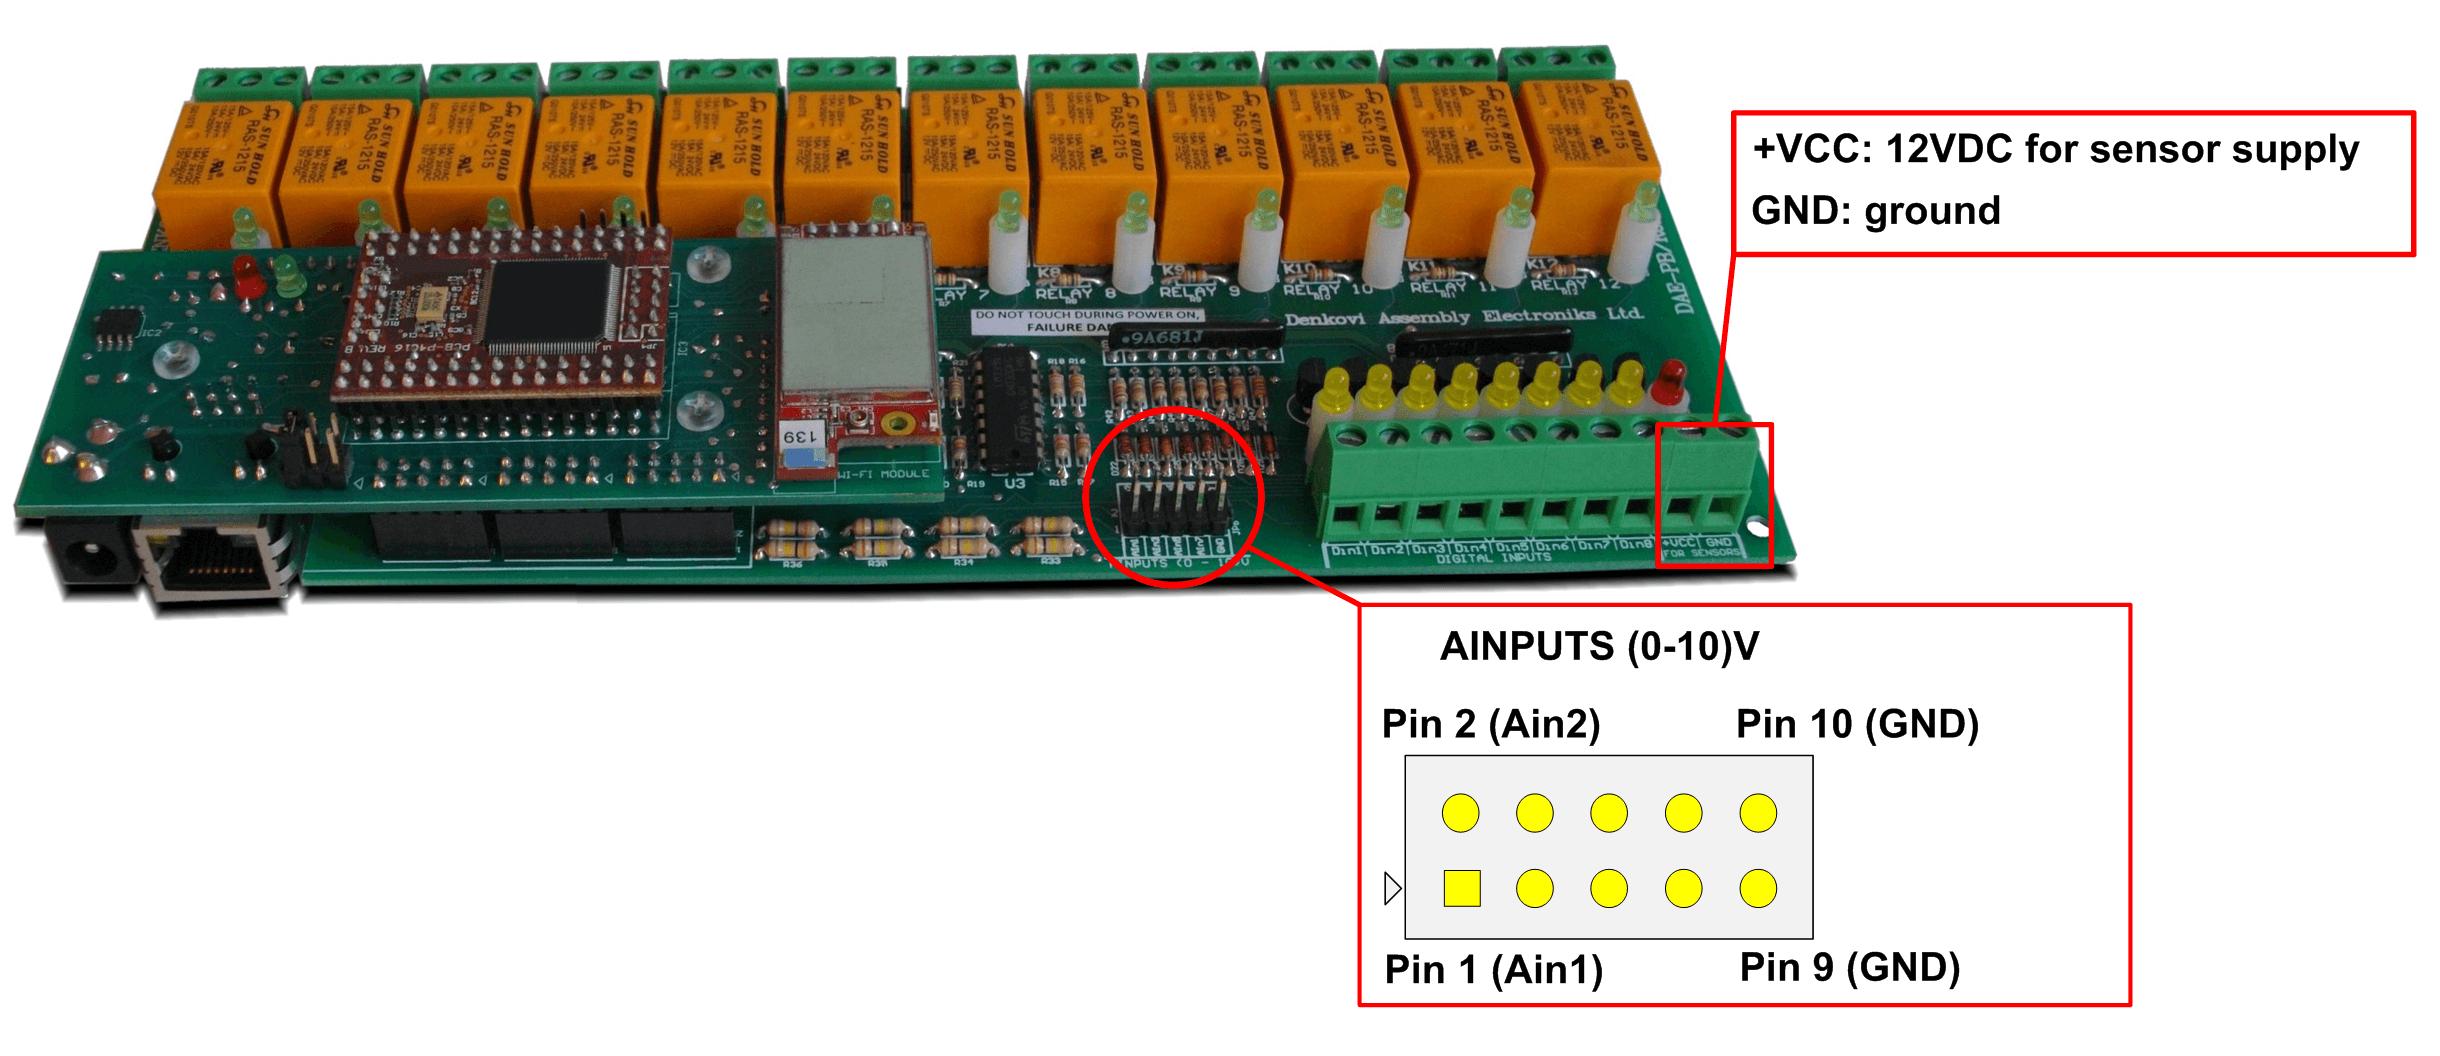 DAEnetIP3 ADC port